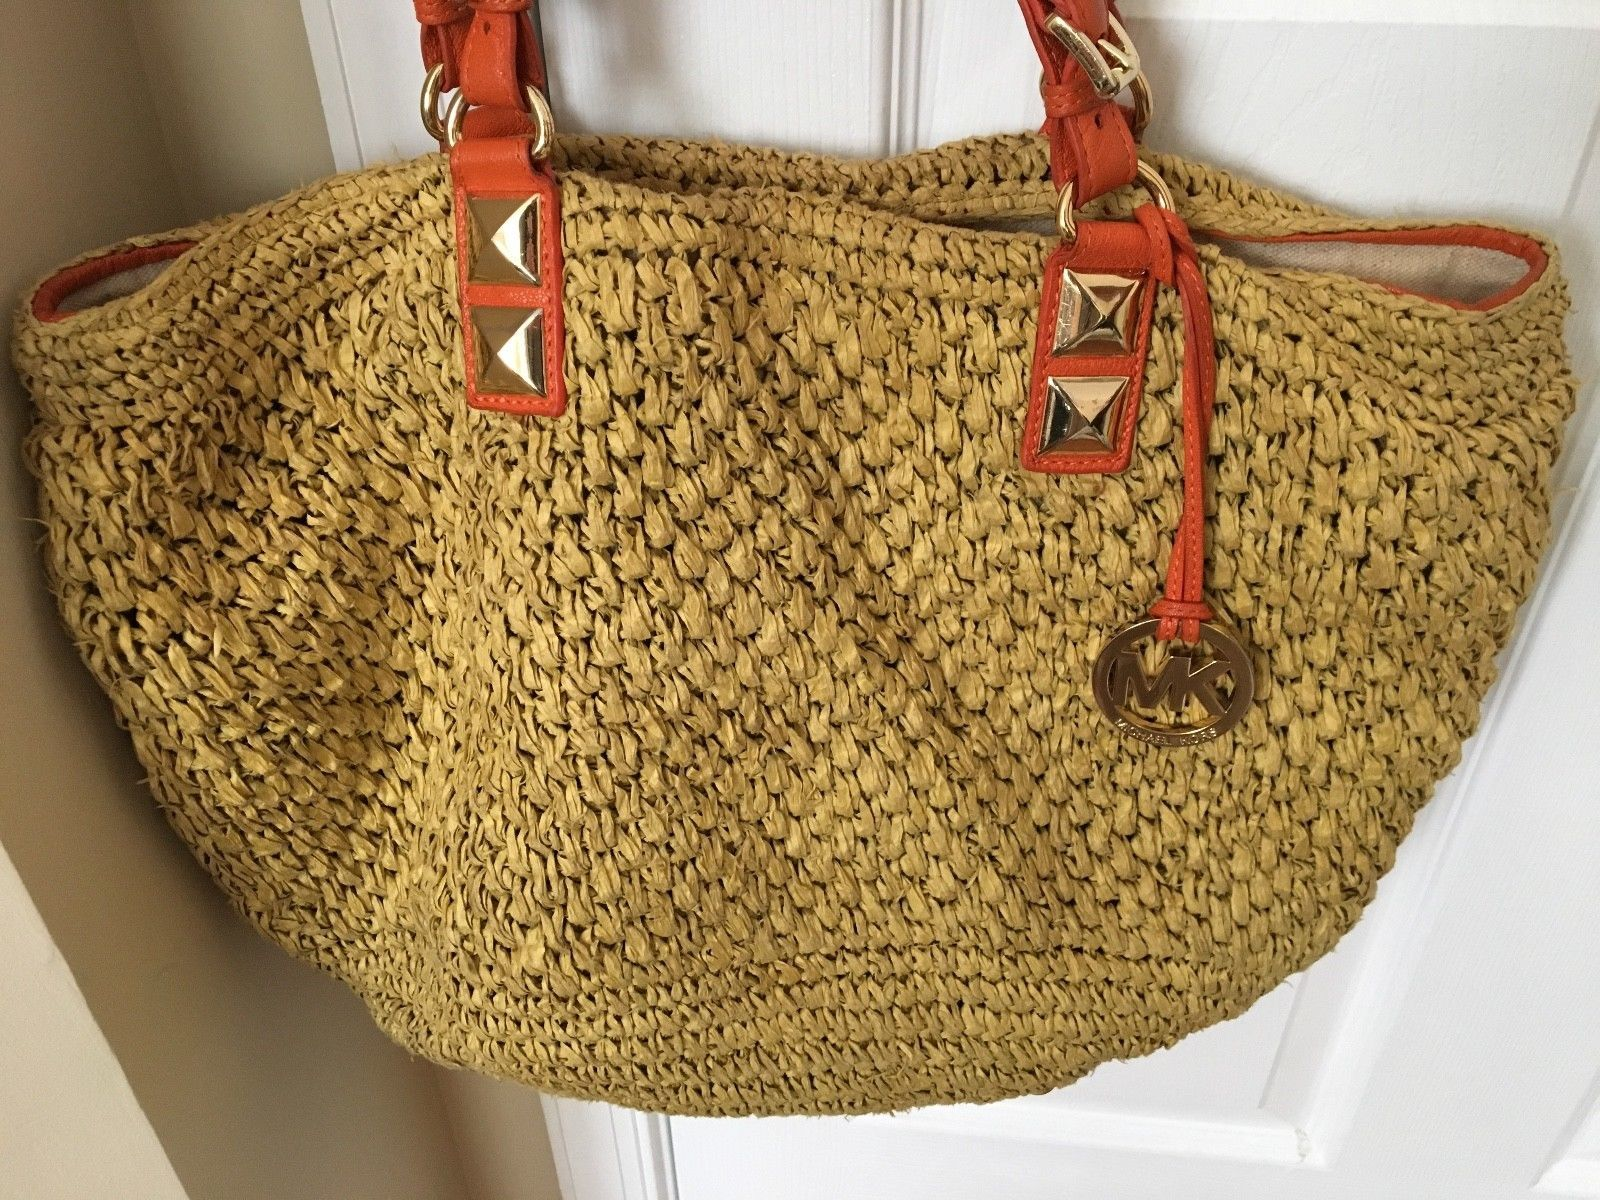 6dfd3b487637 S l1600. S l1600. Previous. Michael Kors MK Santorini Straw Husk Bag Large  Tote Leather Handbag Orange